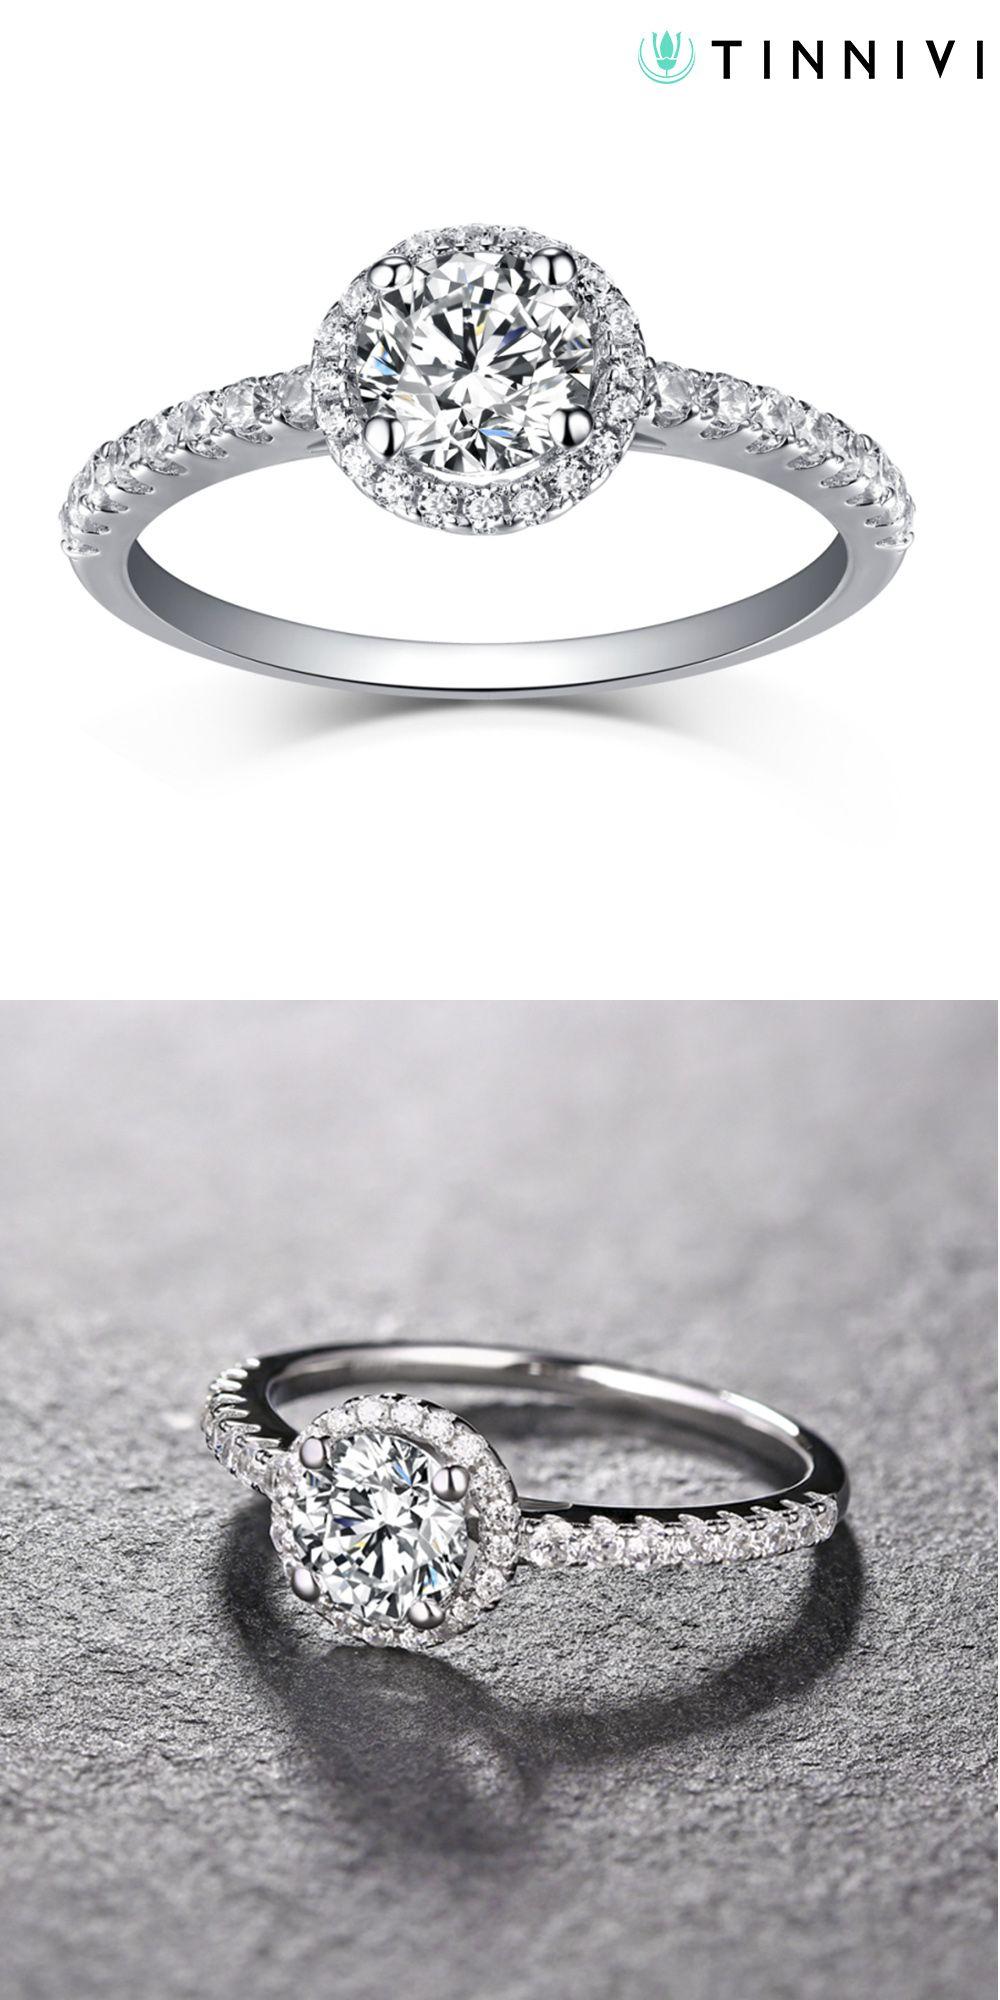 Tinnivi Round Cut Created White Sapphire Sterling Silver Halo